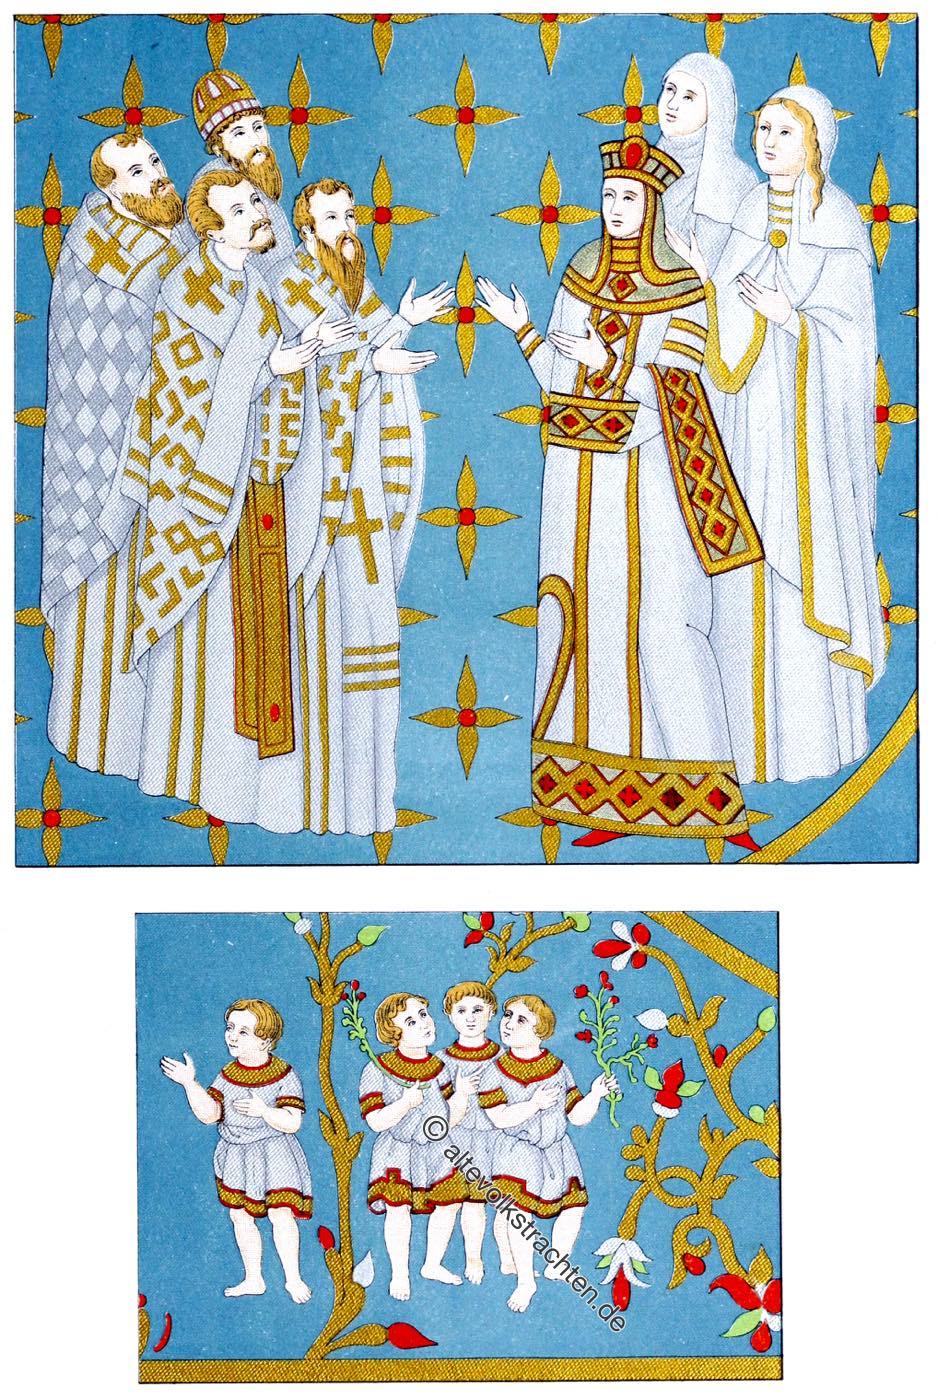 Kaiserdalmatika., Dalmatika, Ornat, Mittelalter, Papst, Leo III, Hefner-Alteneck,